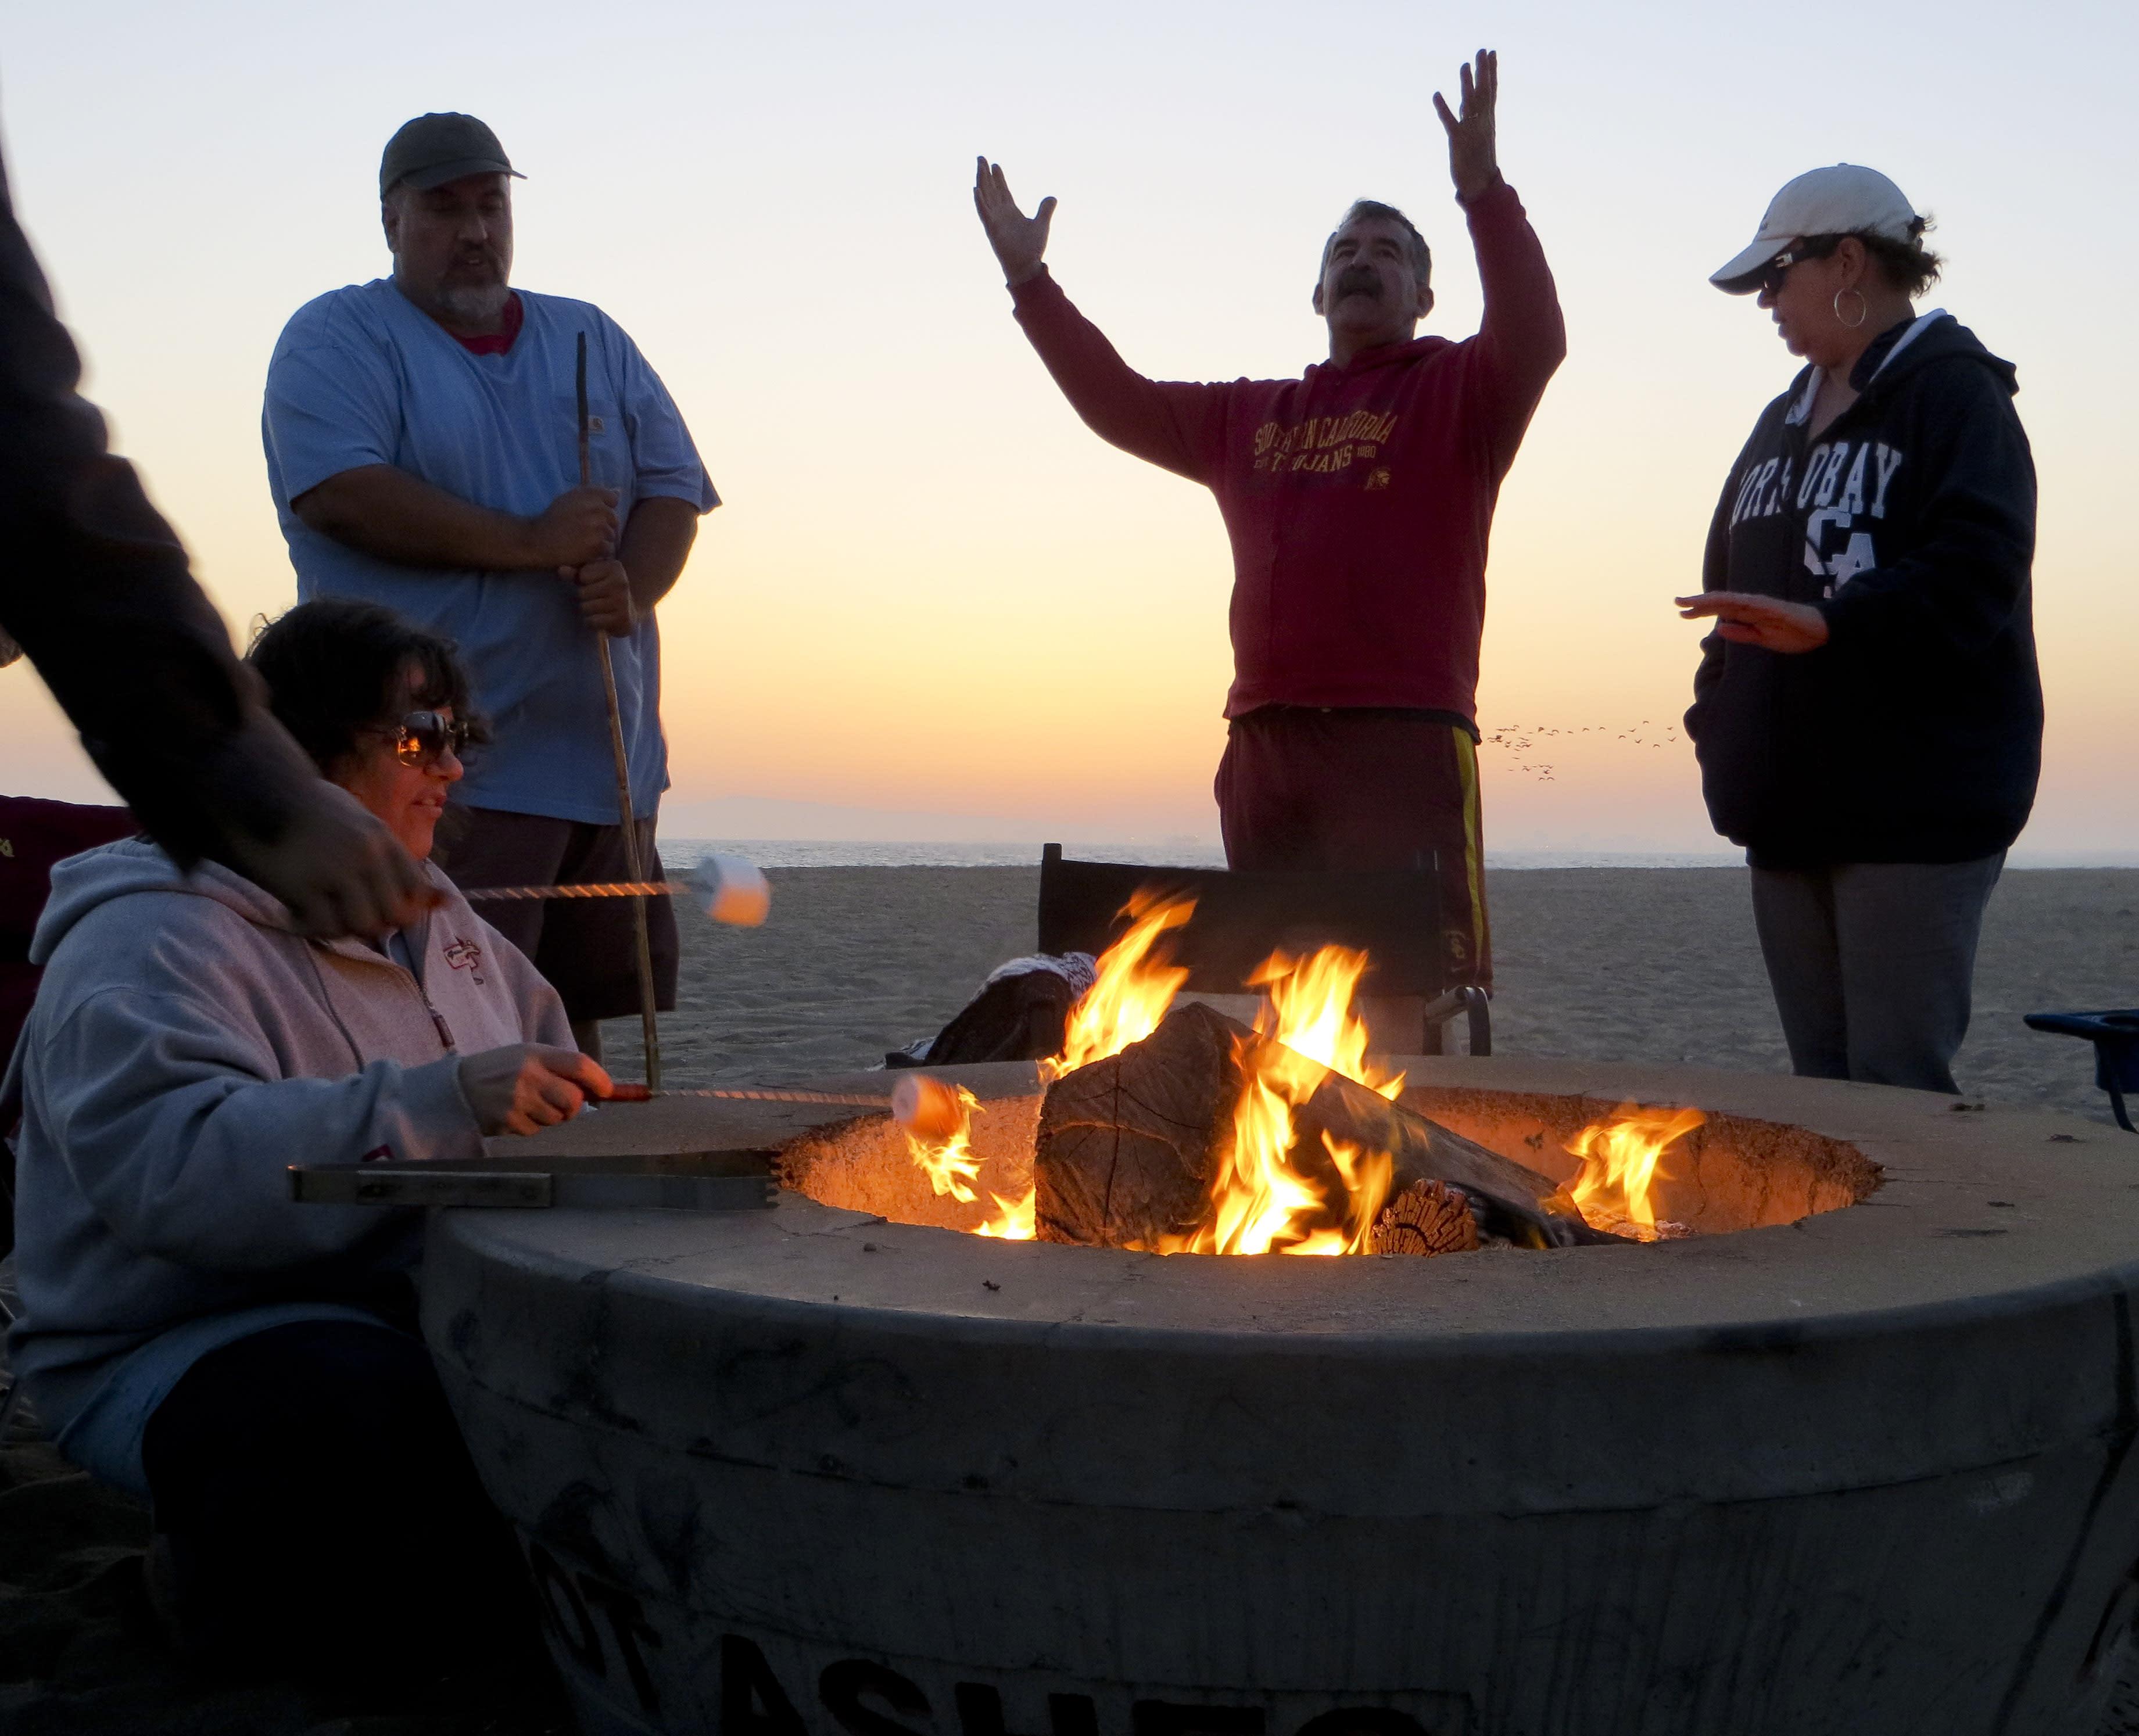 Beach bonfire spat s hot in Southern California